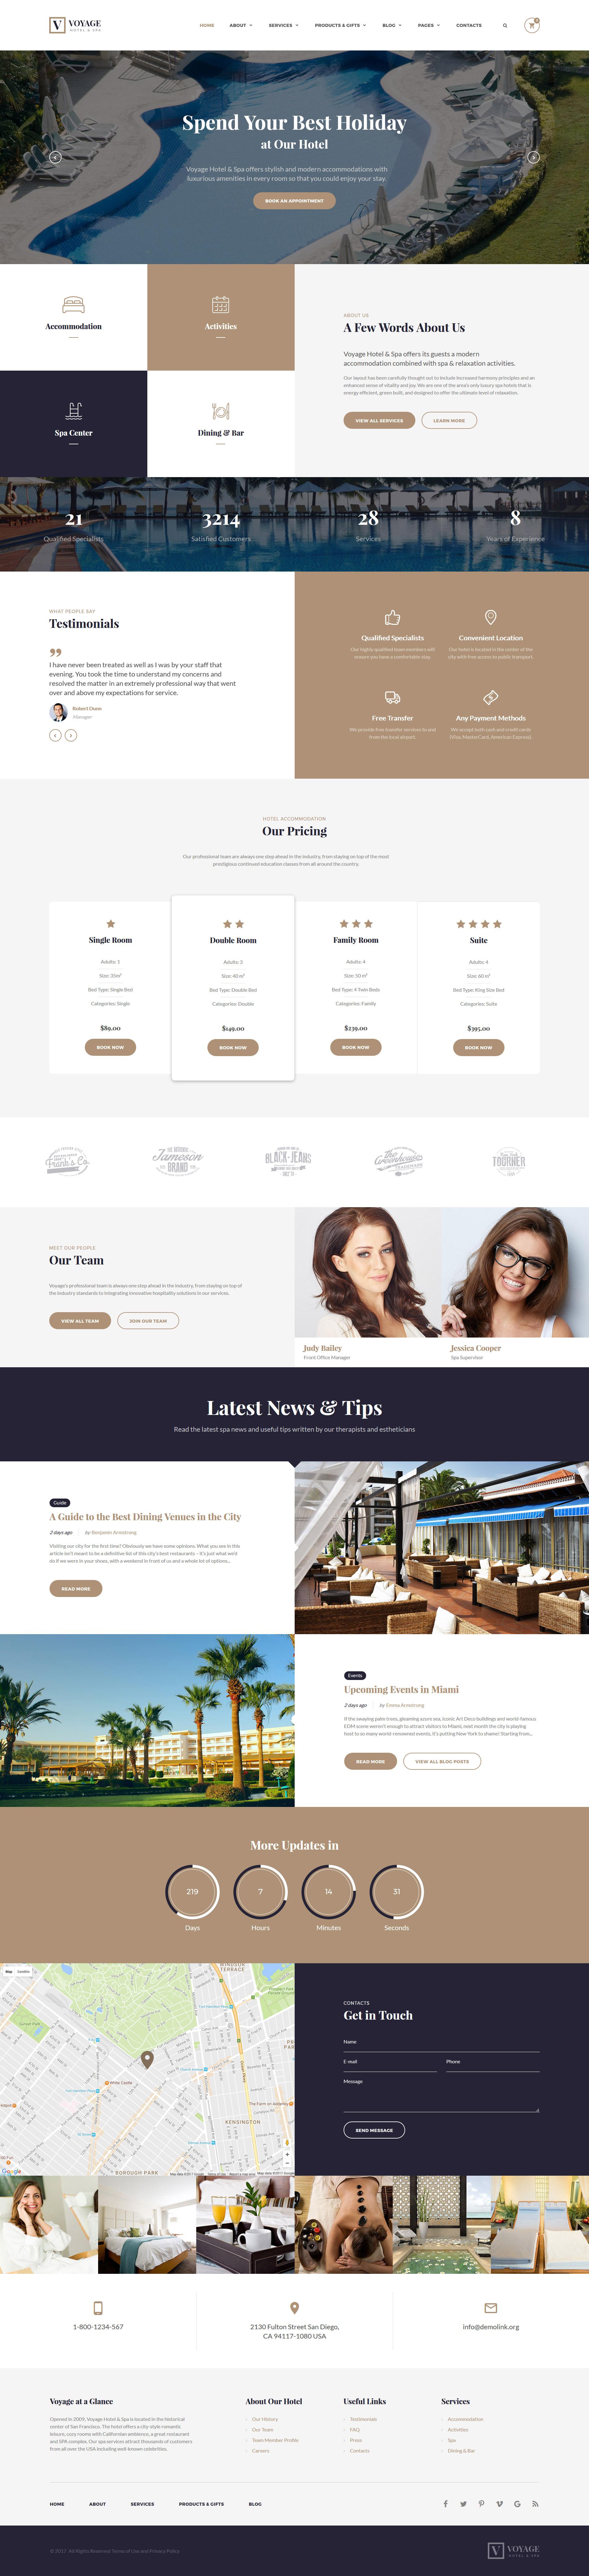 Hotels Responsive Website Template - screenshot